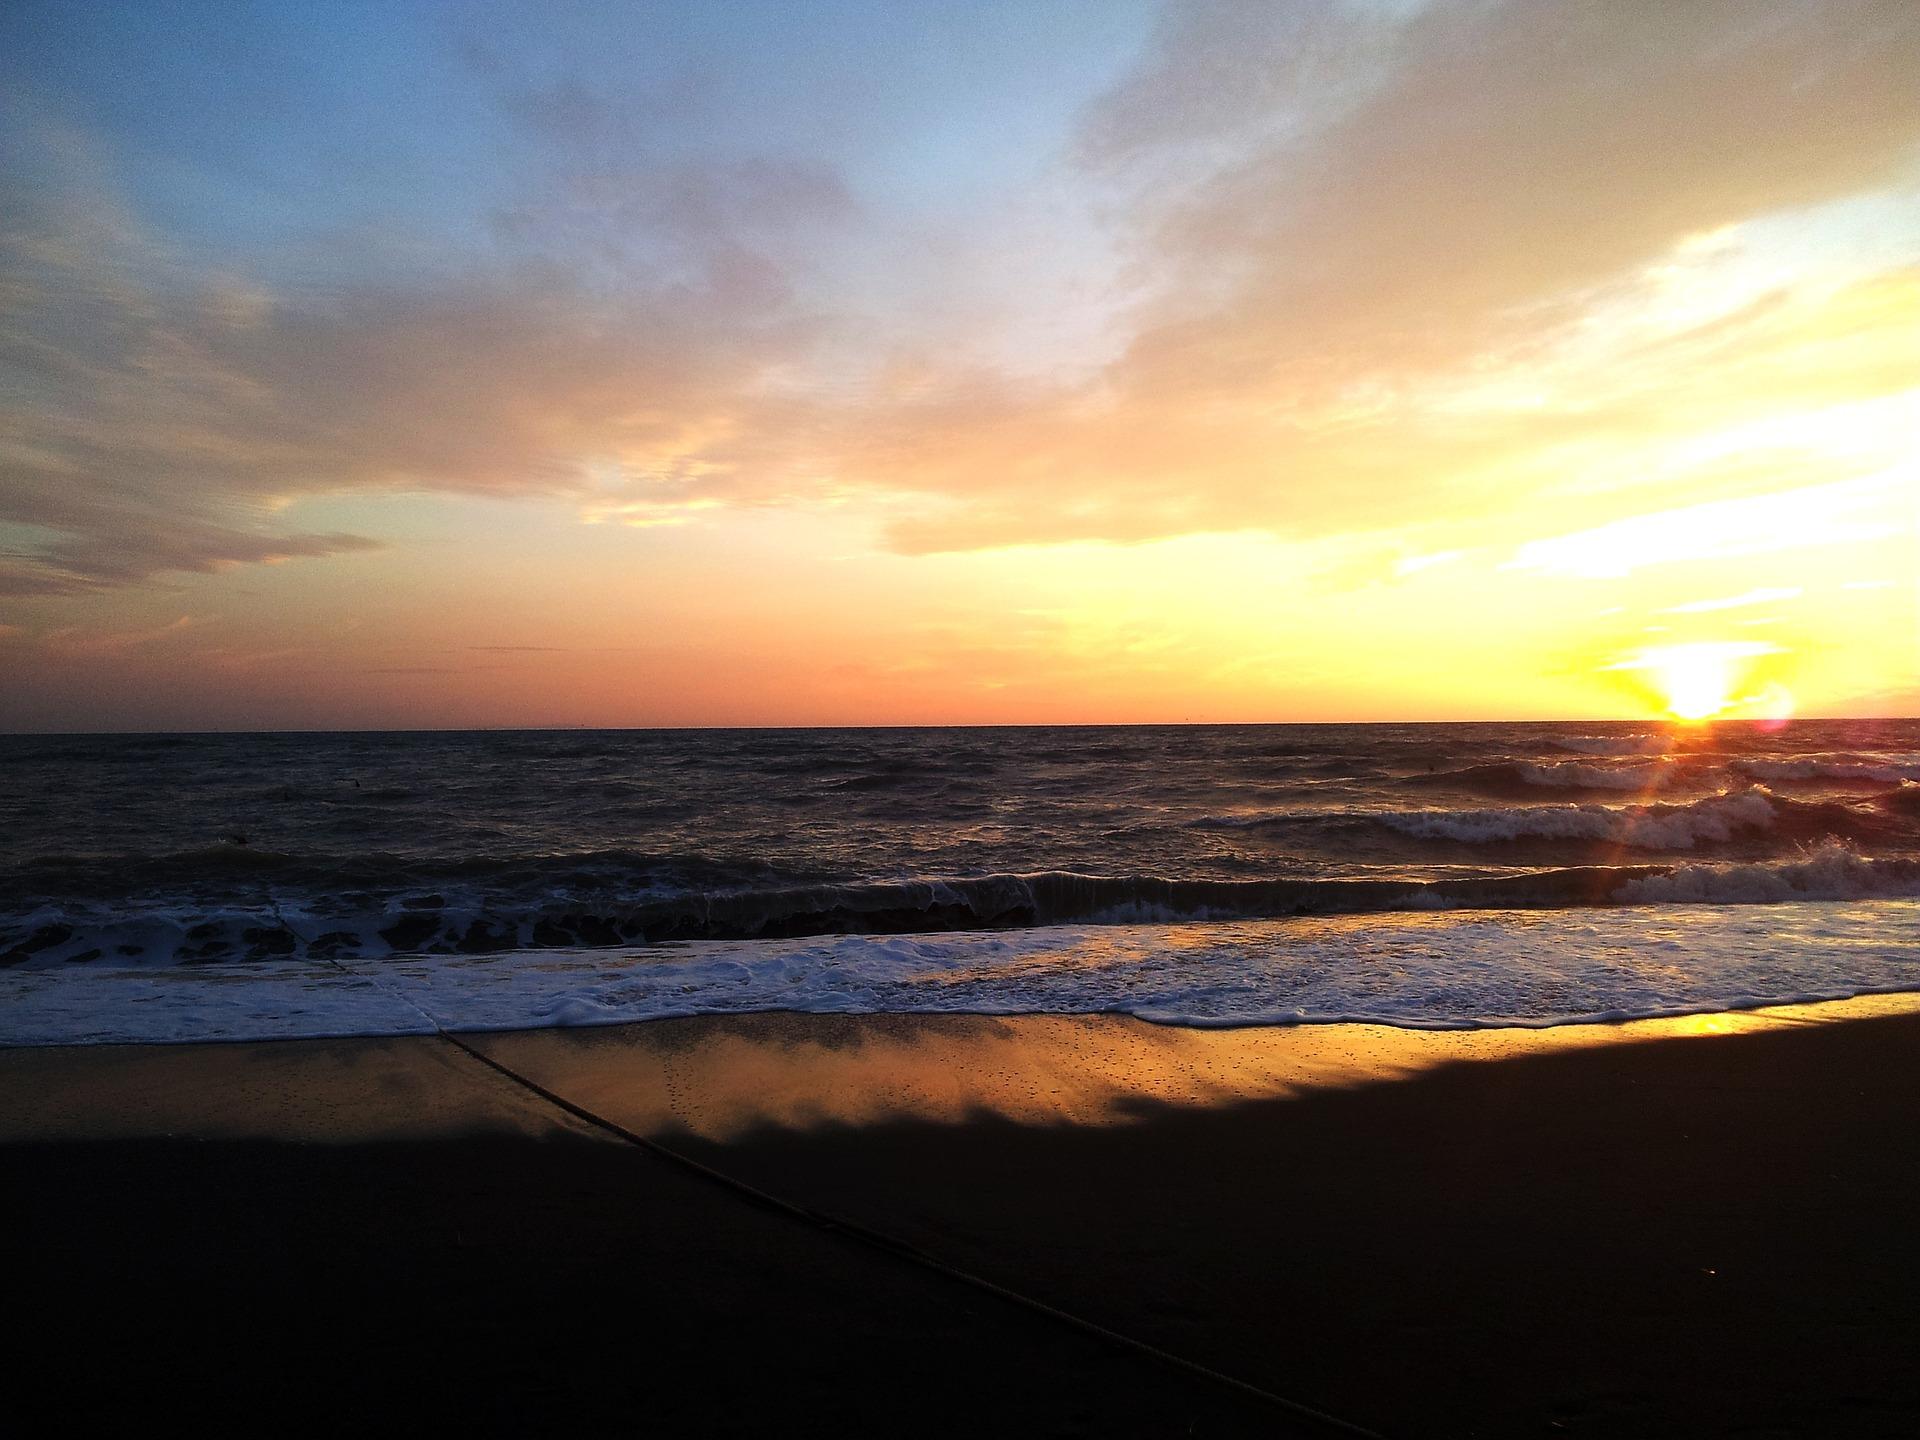 sunset-756538_1920